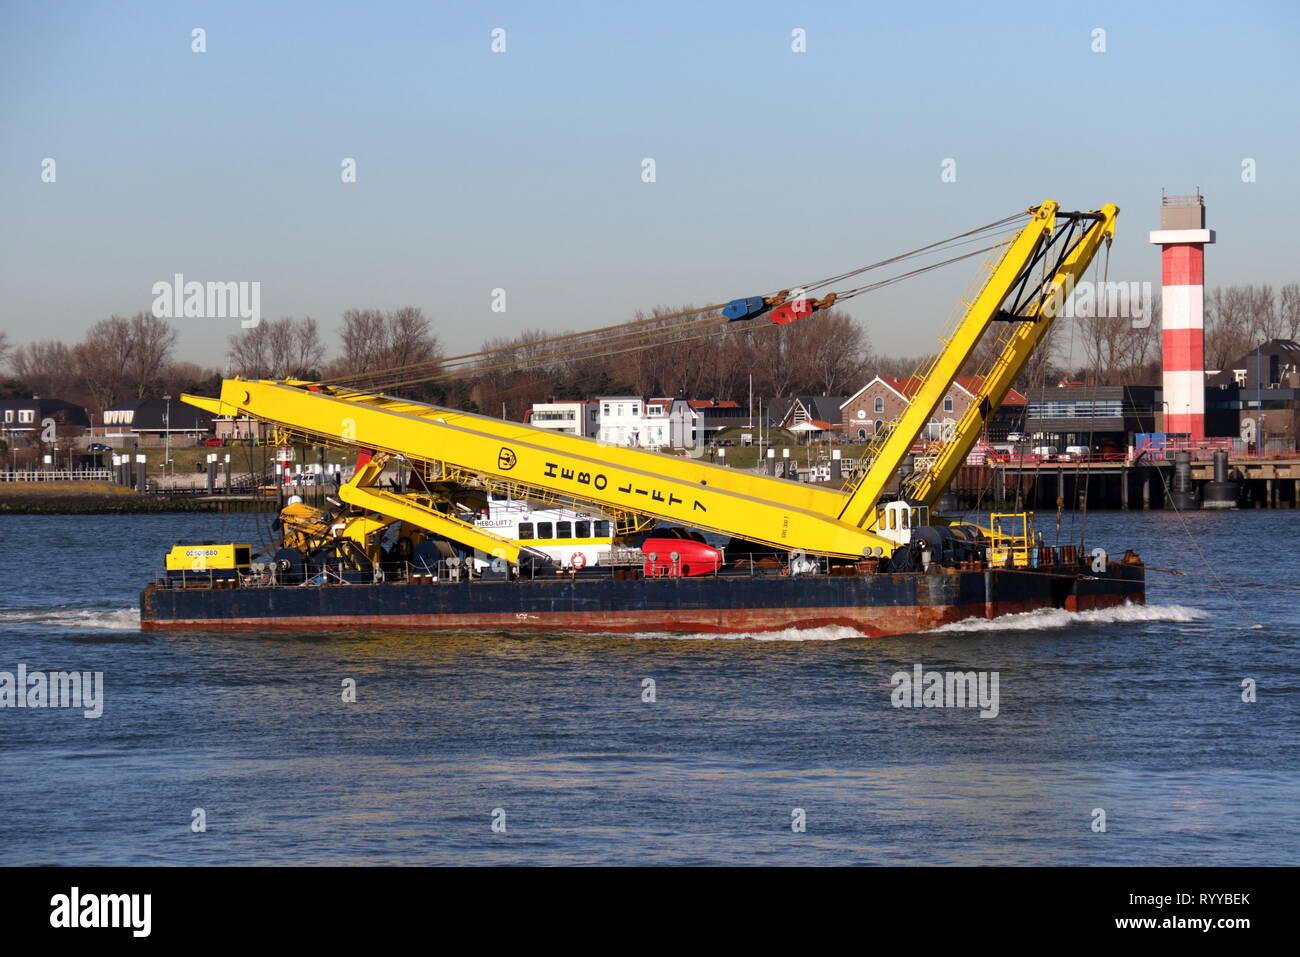 The Hebo Lift 7 crane ship will reach the port of Rotterdam on 15 February 2019. - Stock Image